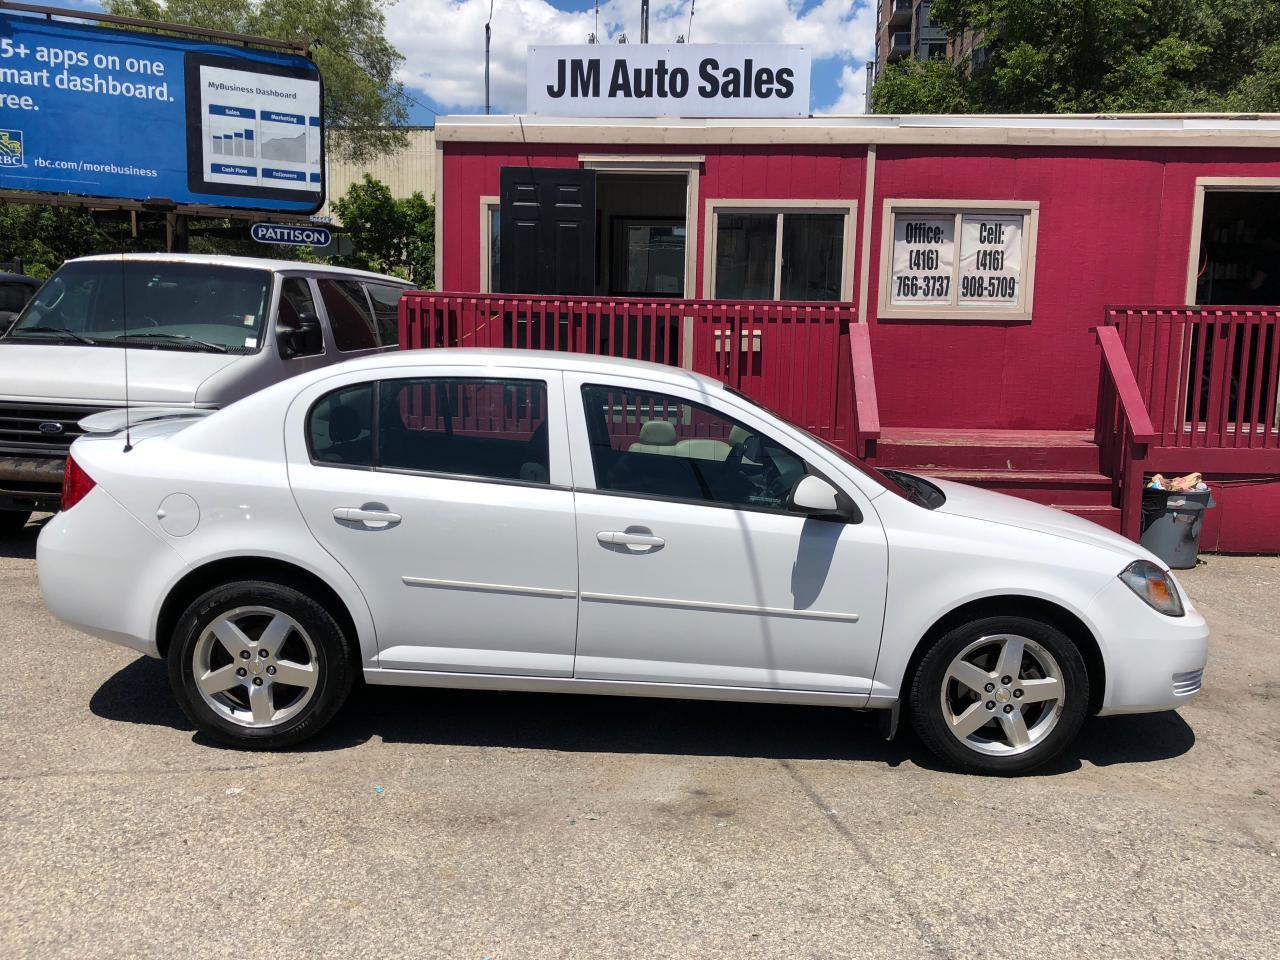 Photo of White 2010 Chevrolet Cobalt